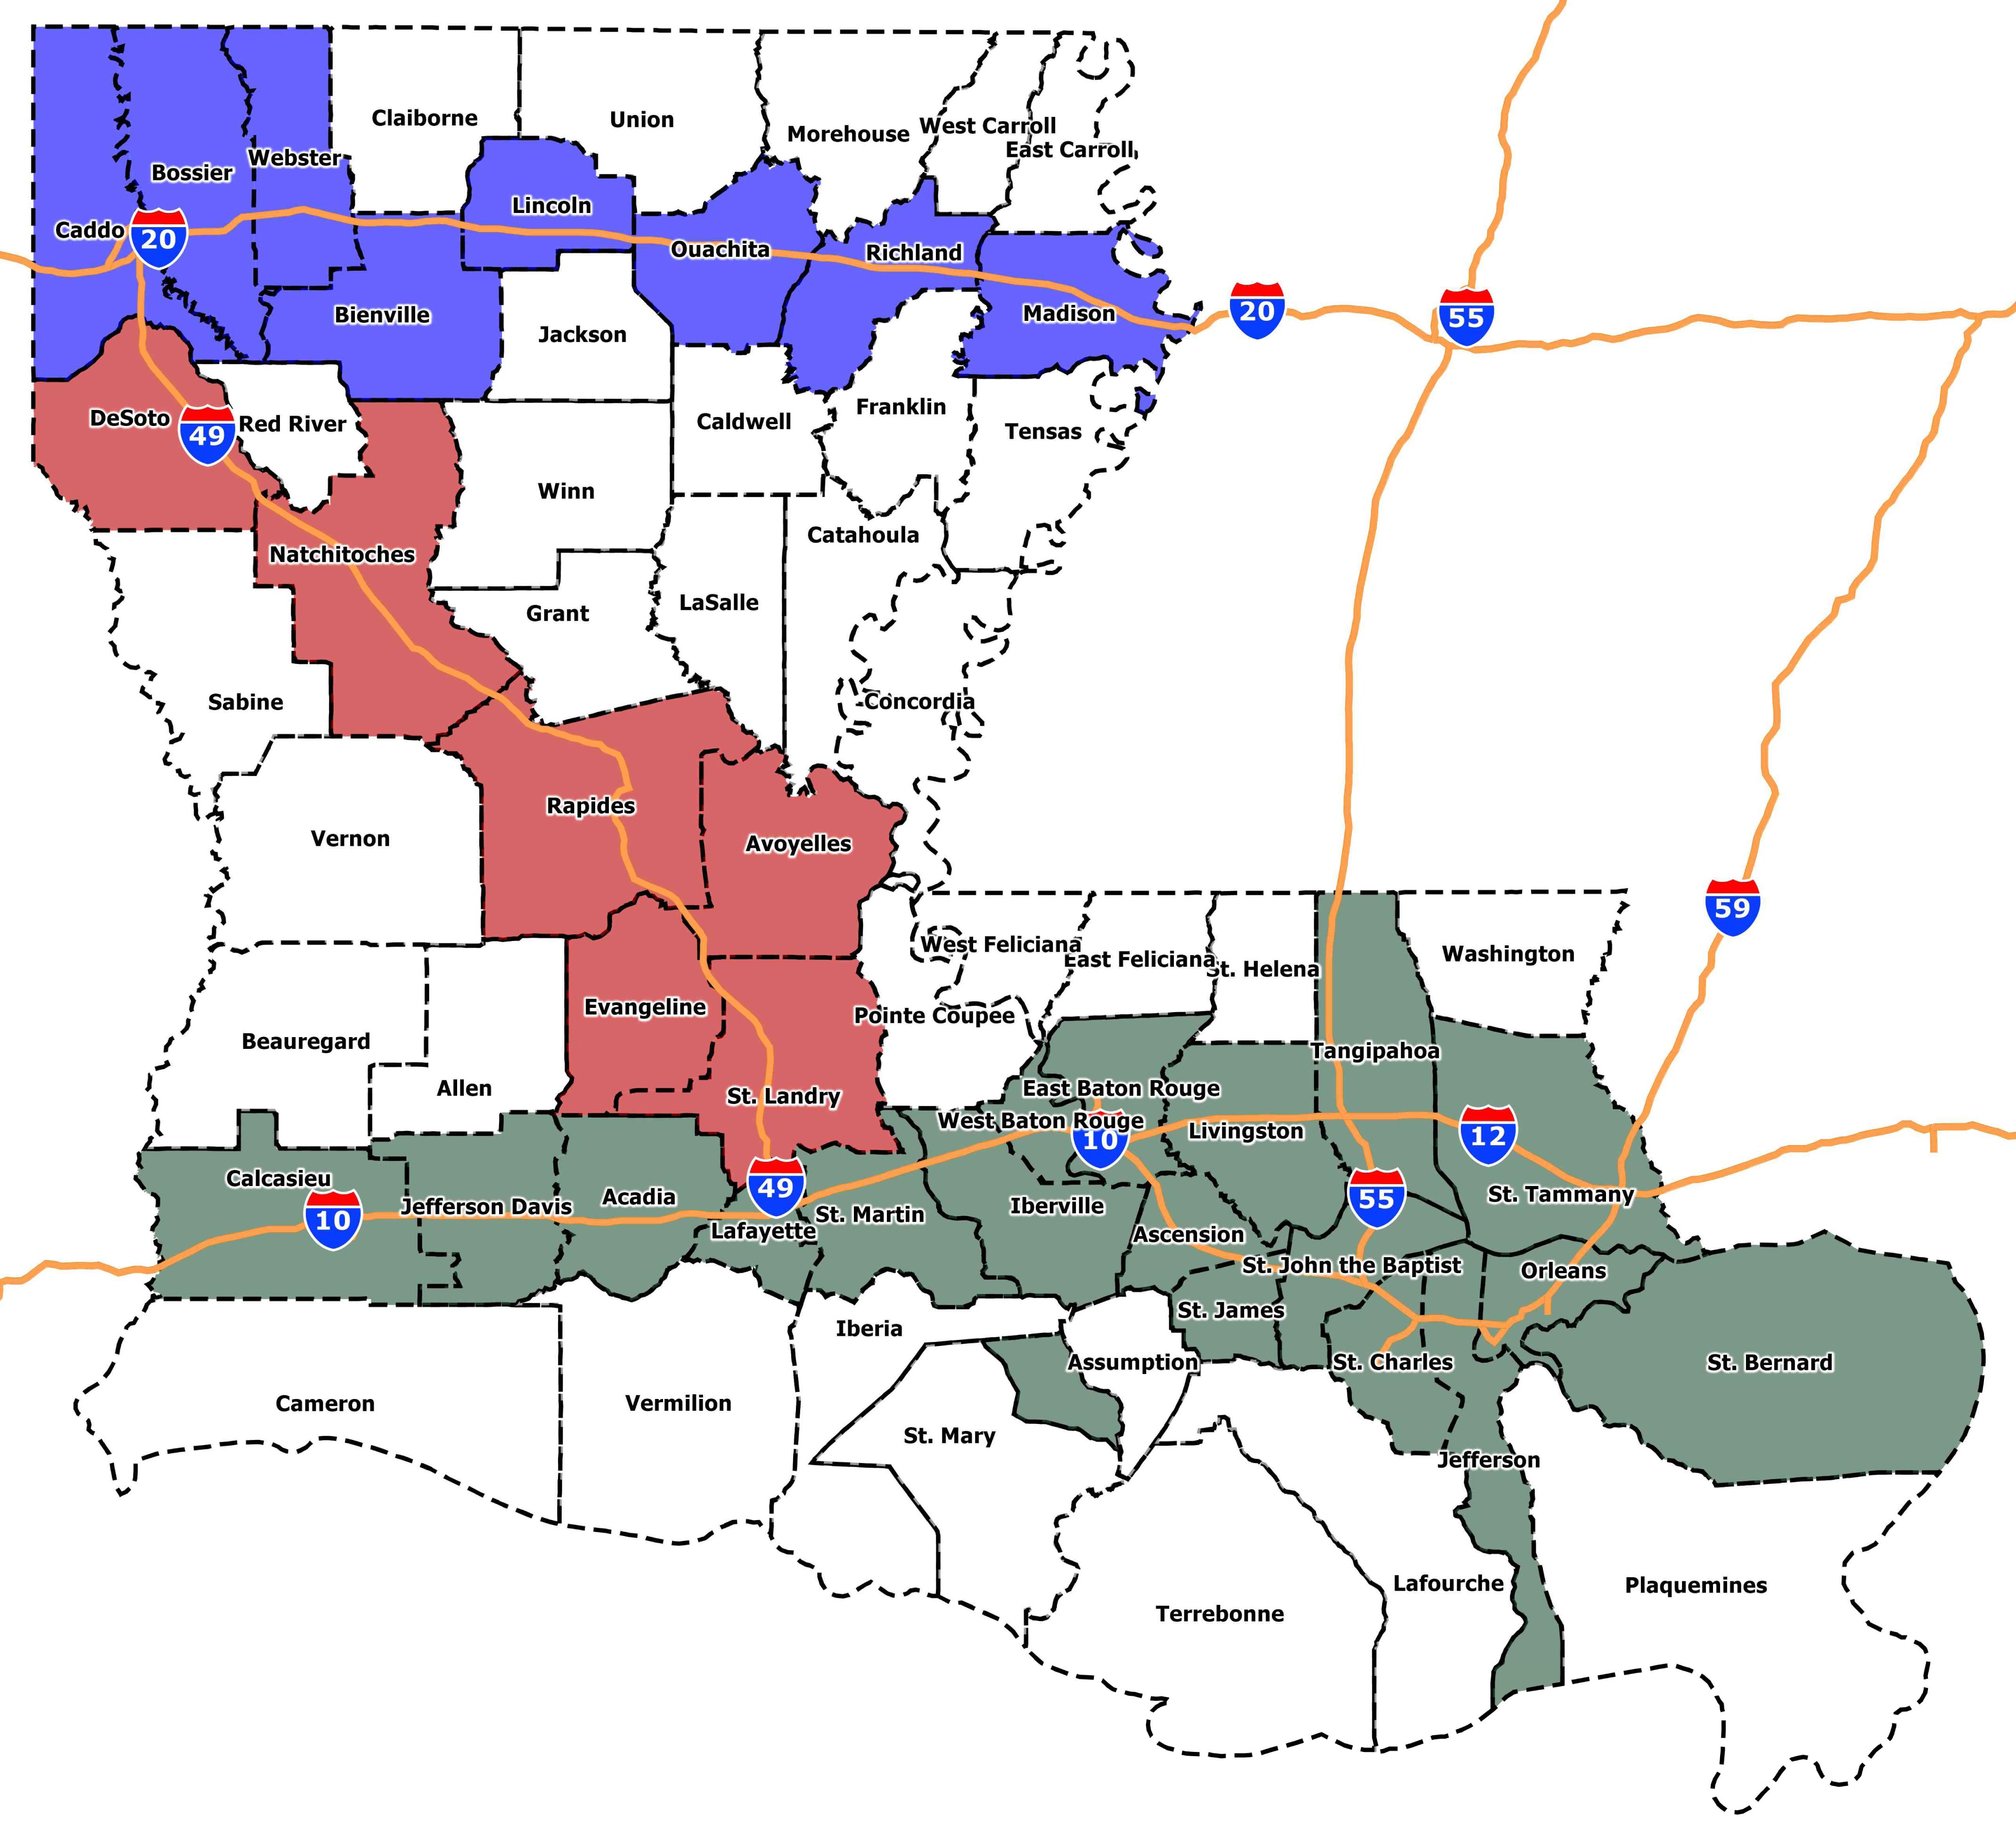 I 20 Louisiana Map.2017 Louisiana Census Estimates By Parish Jmc Enterprises Of